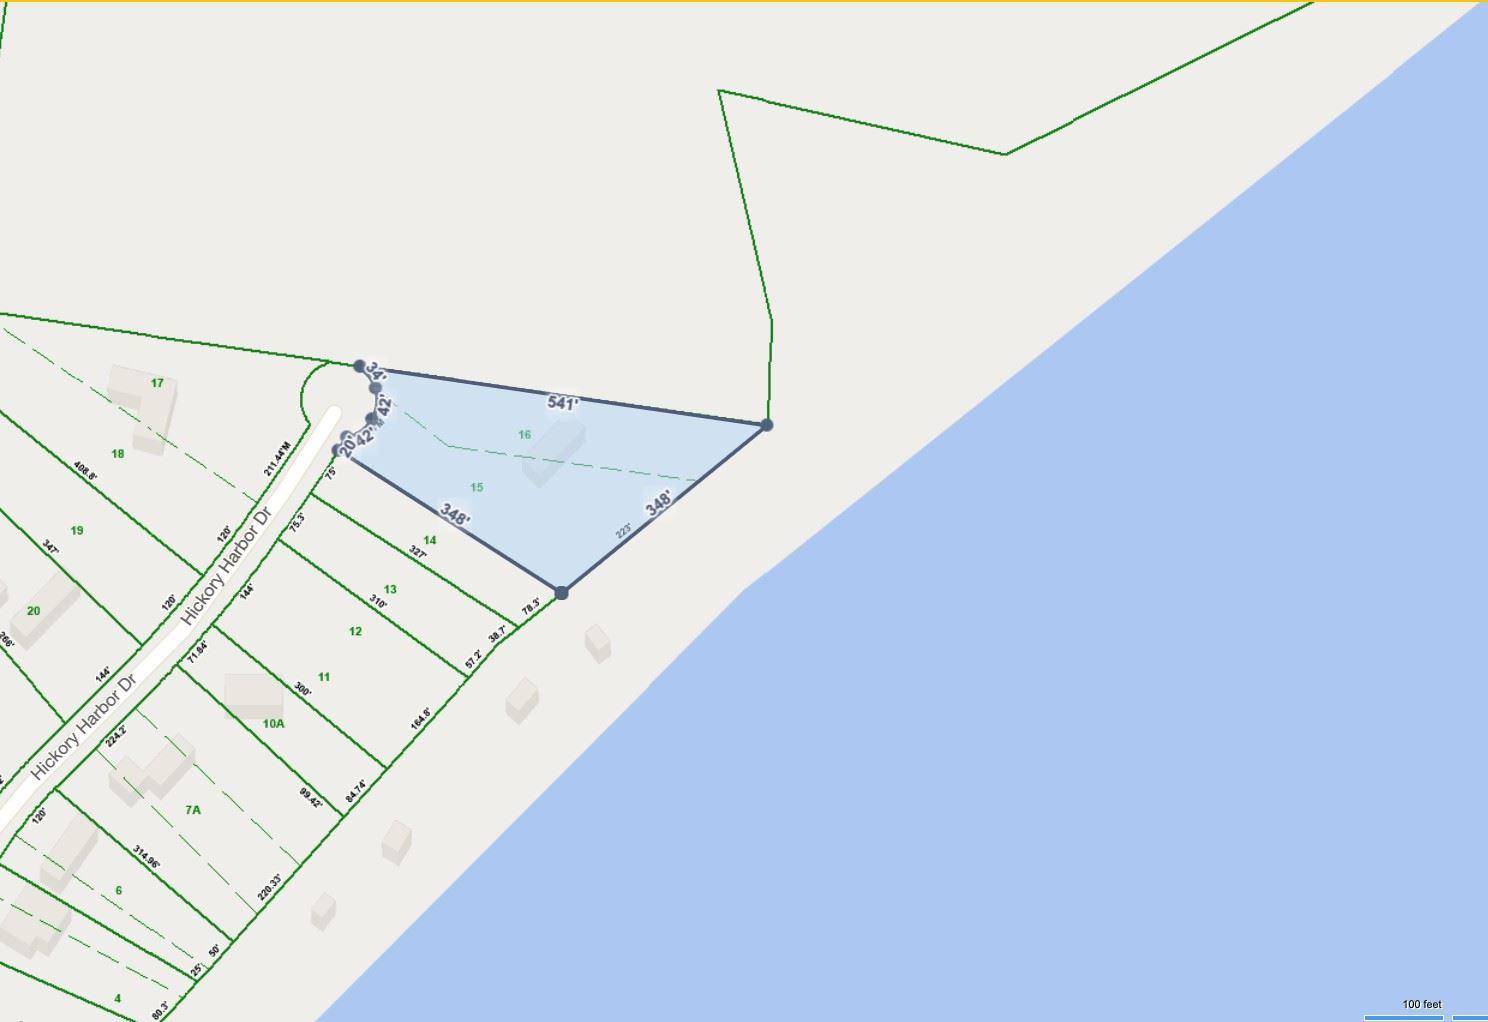 Photo of 1094 Hickory Harbor Dr, Gallatin, TN 37066 (MLS # 2153179)